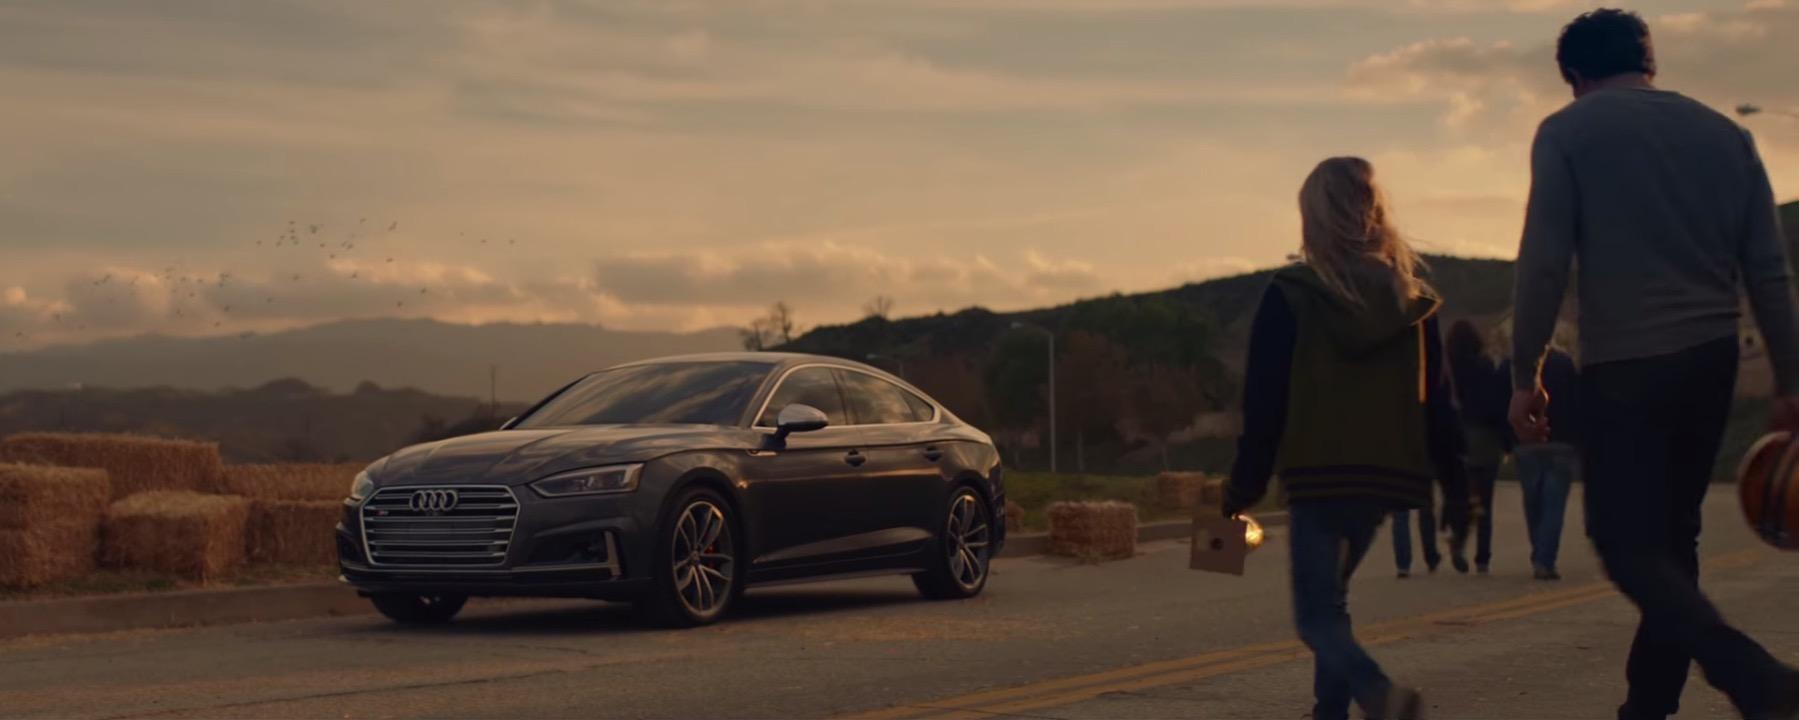 6221426ca1 Audi s Heartwarming Super Bowl Commercial - indiGO Auto Group Blog